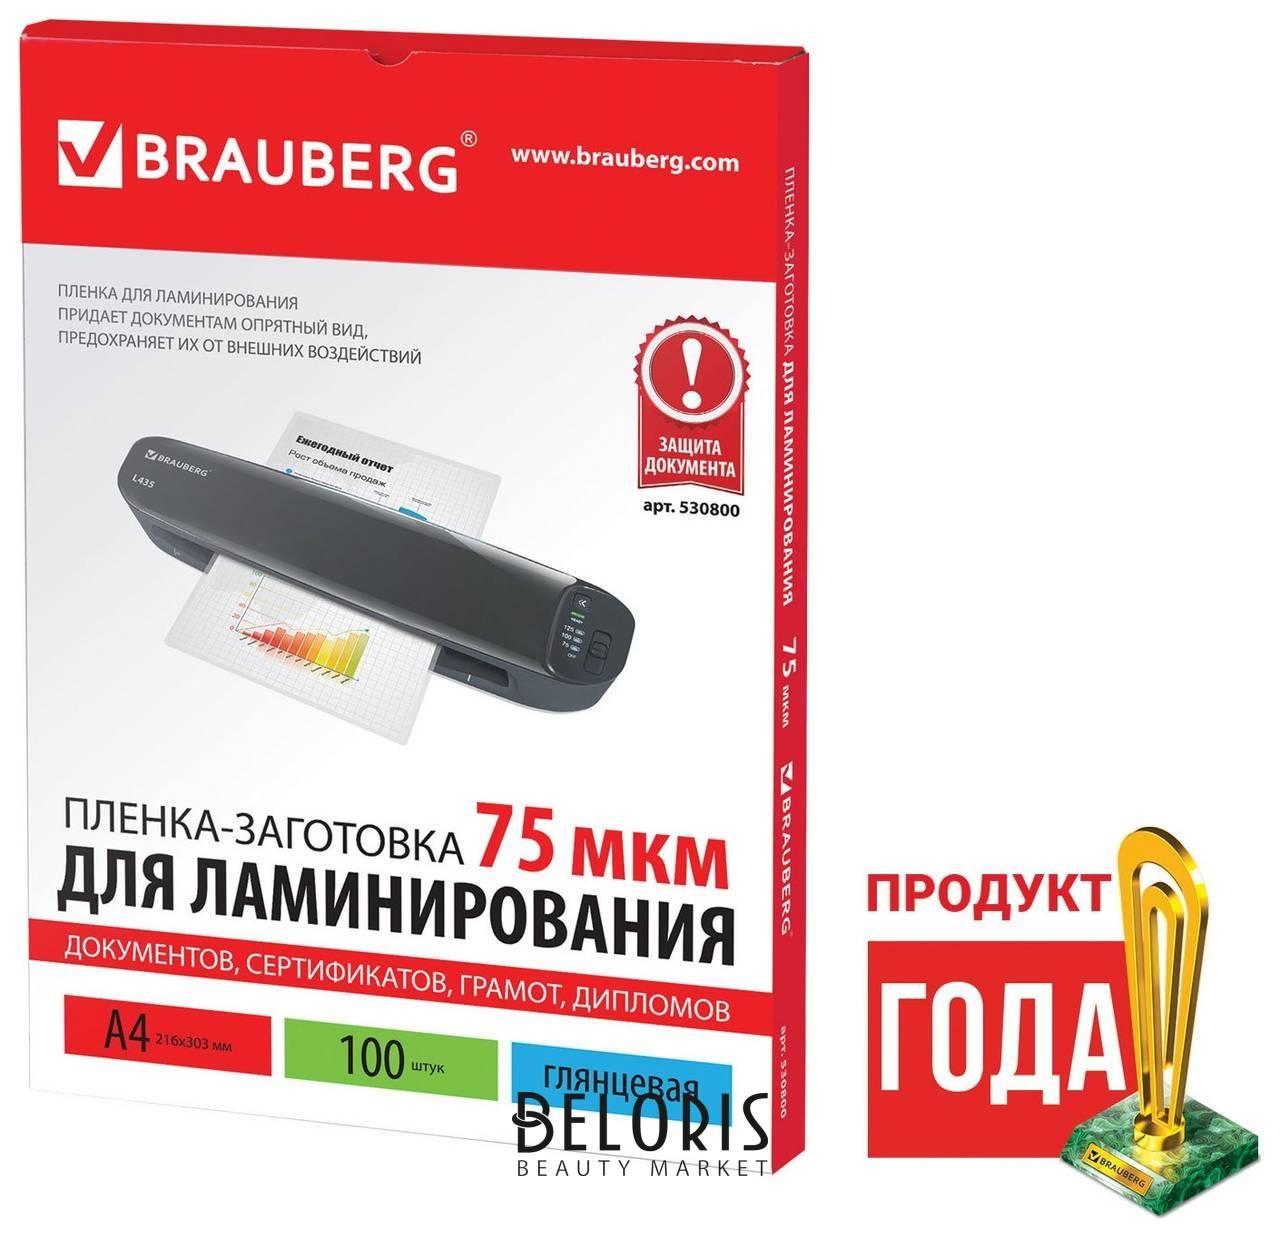 Пленки-заготовки для ламинирования, А4, комплект 100 шт., 75 мкм, BRAUBERG  Brauberg